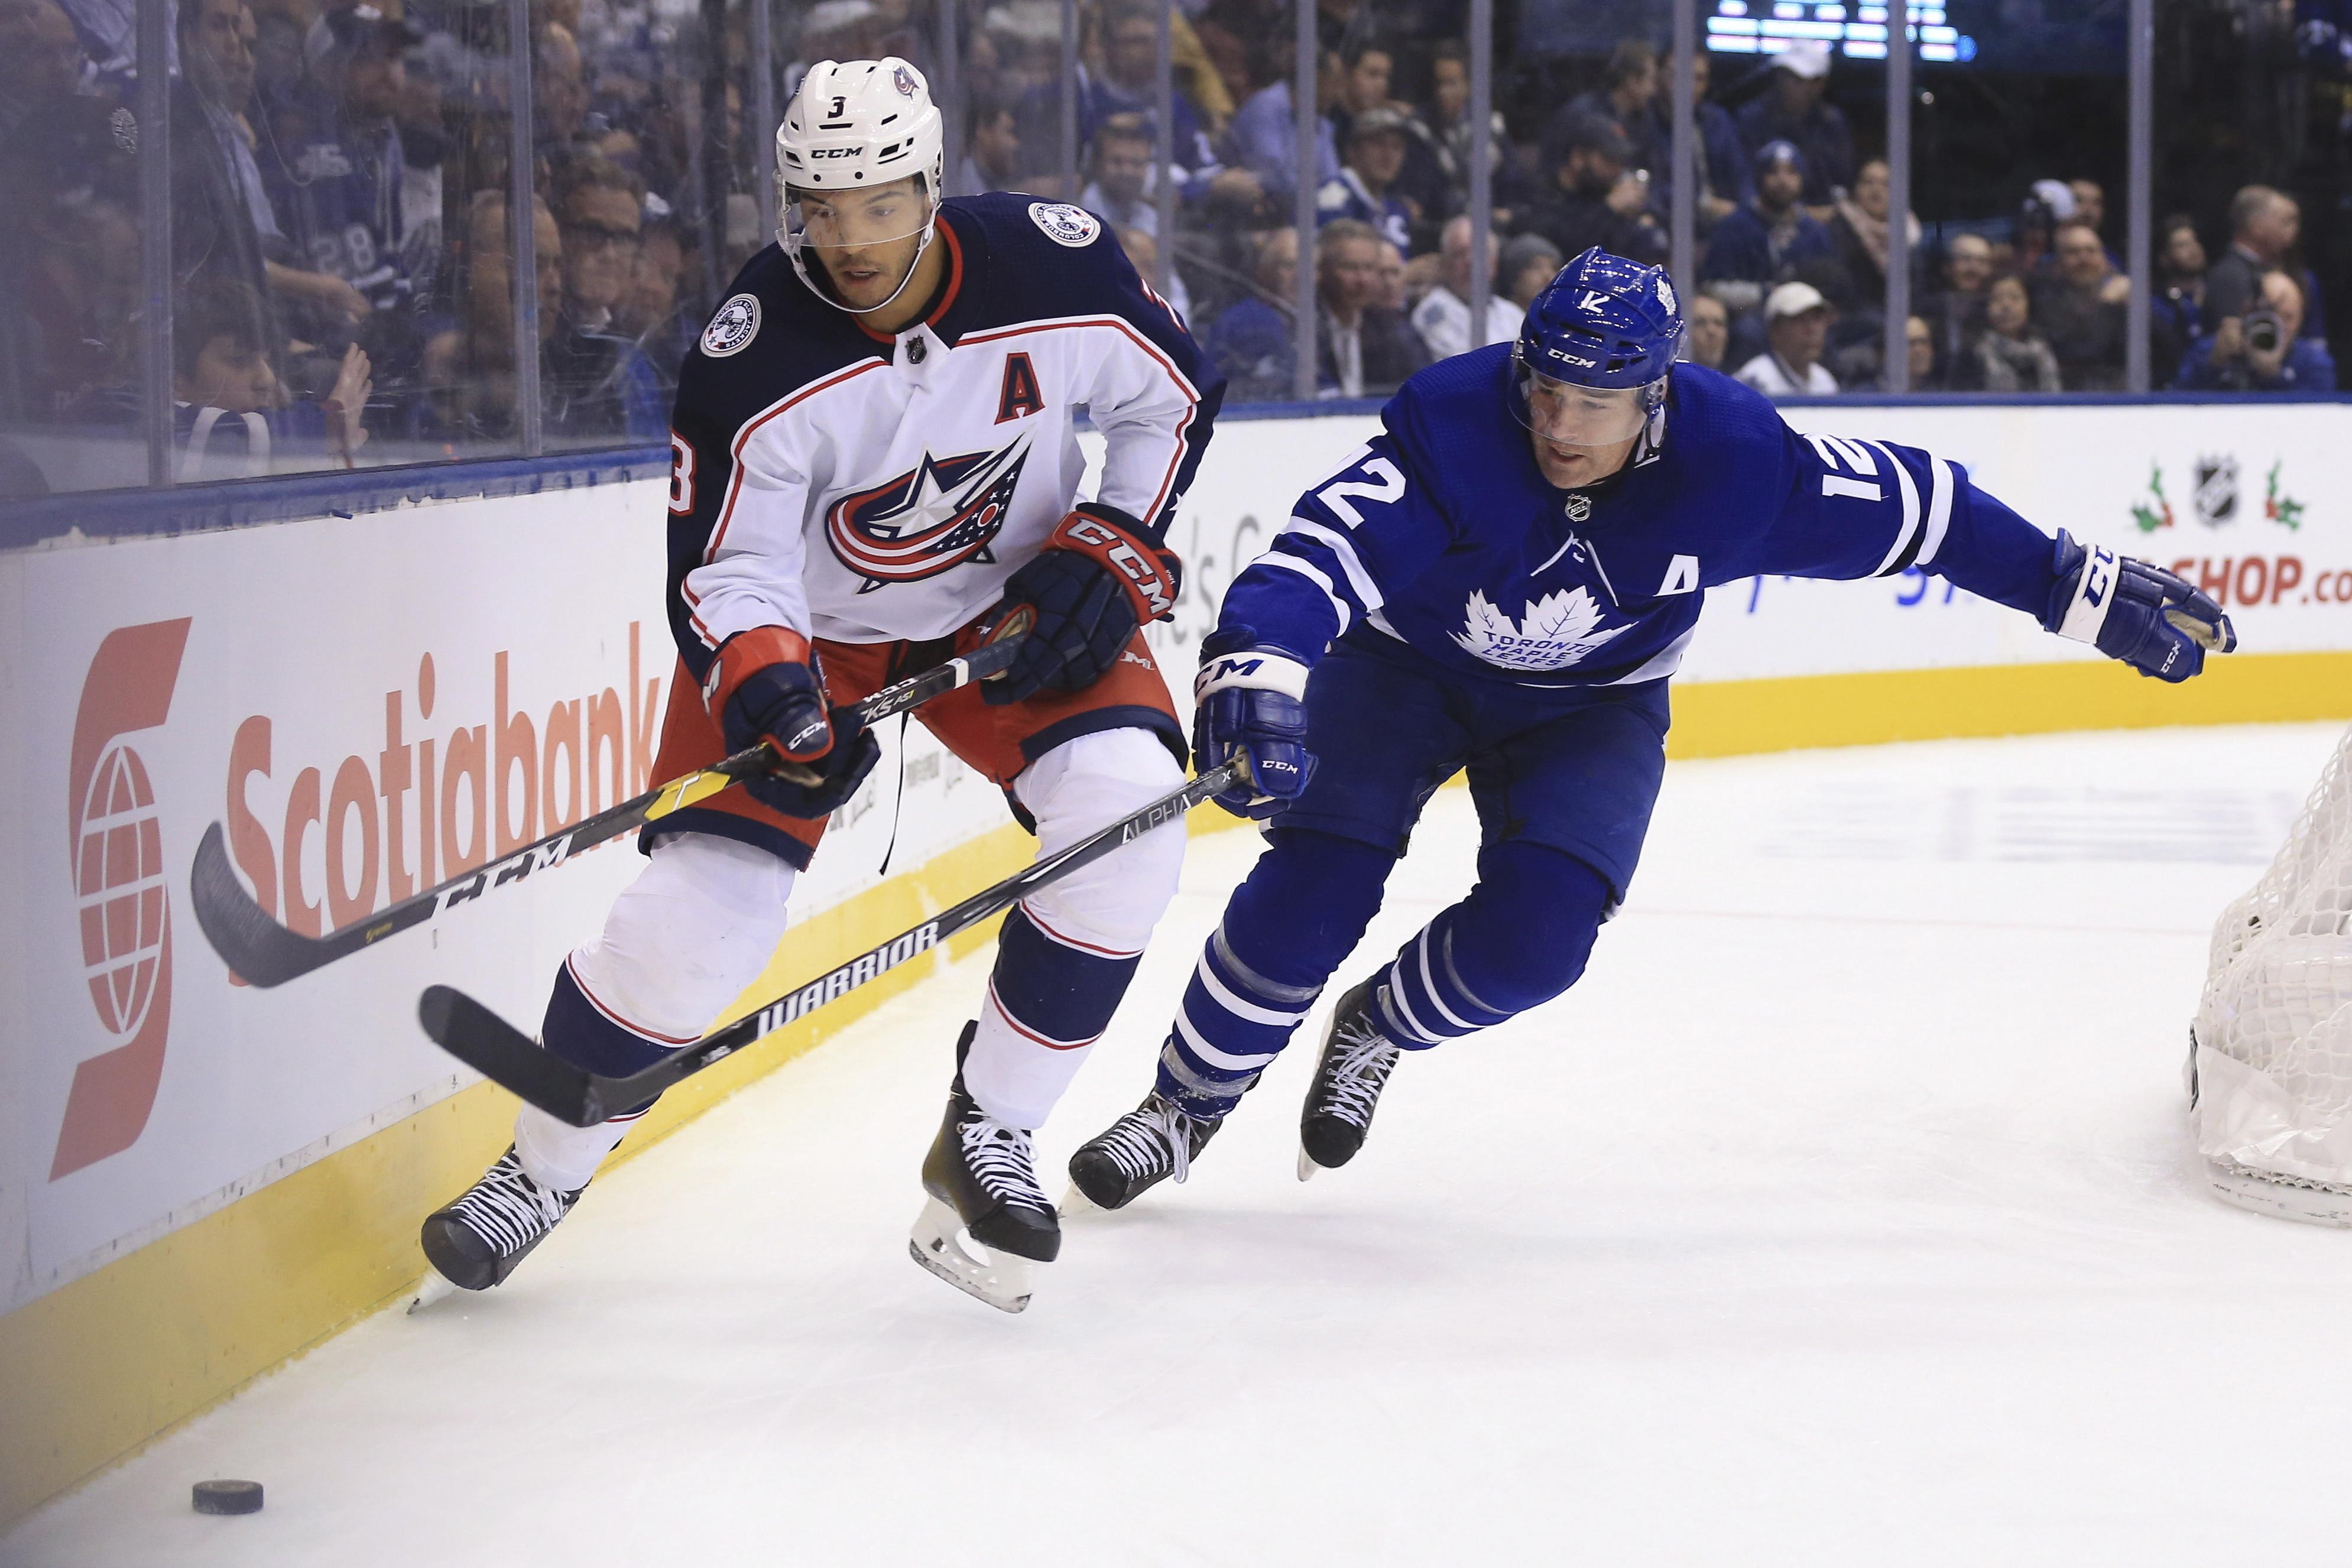 Hyman scores twice, Maple Leafs top Blue Jackets 4-2